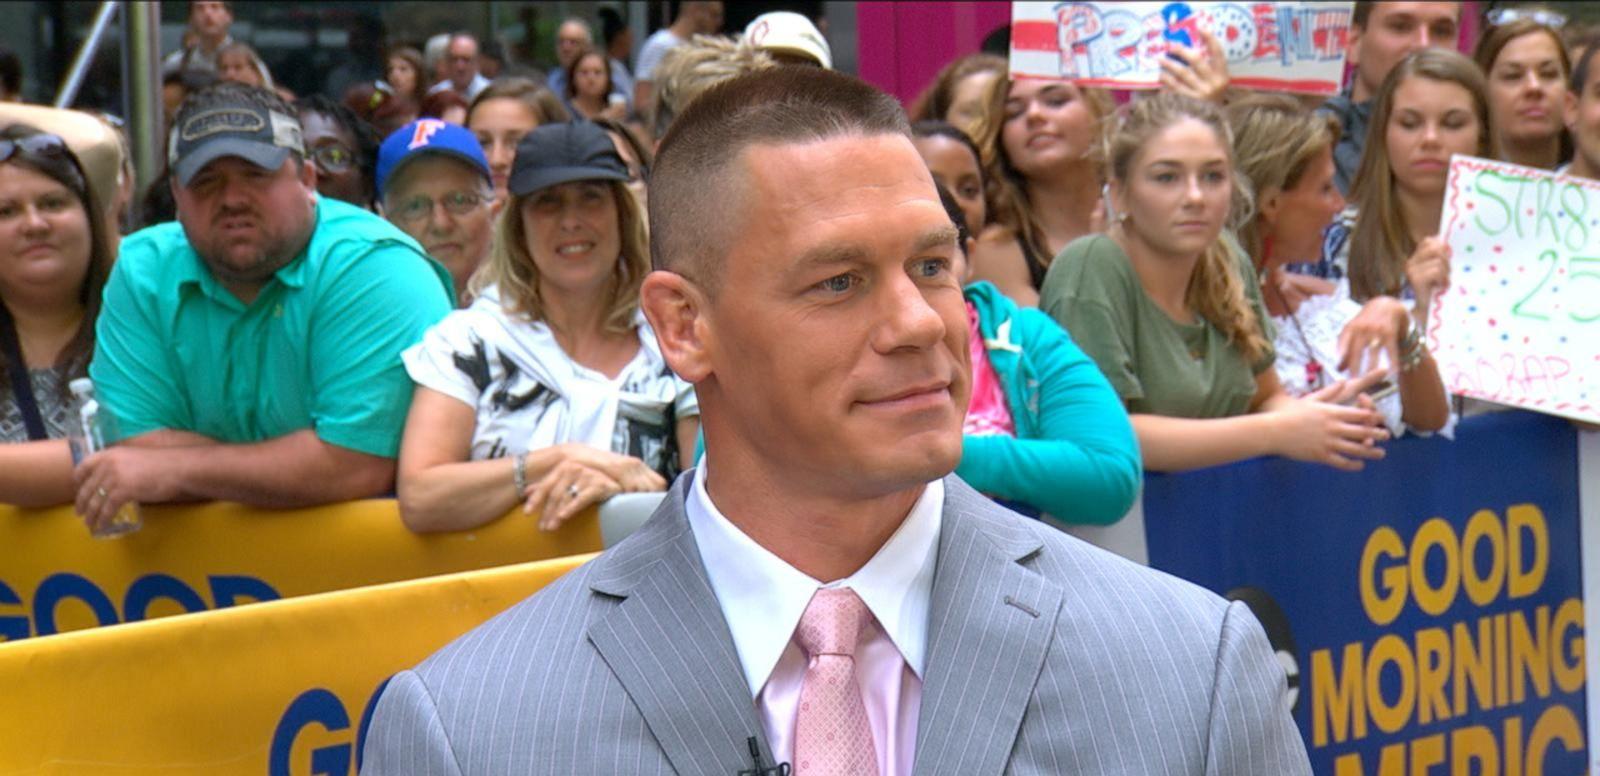 VIDEO: ESPYs 2016: Special Award and WWE Star John Cena Live on 'GMA'